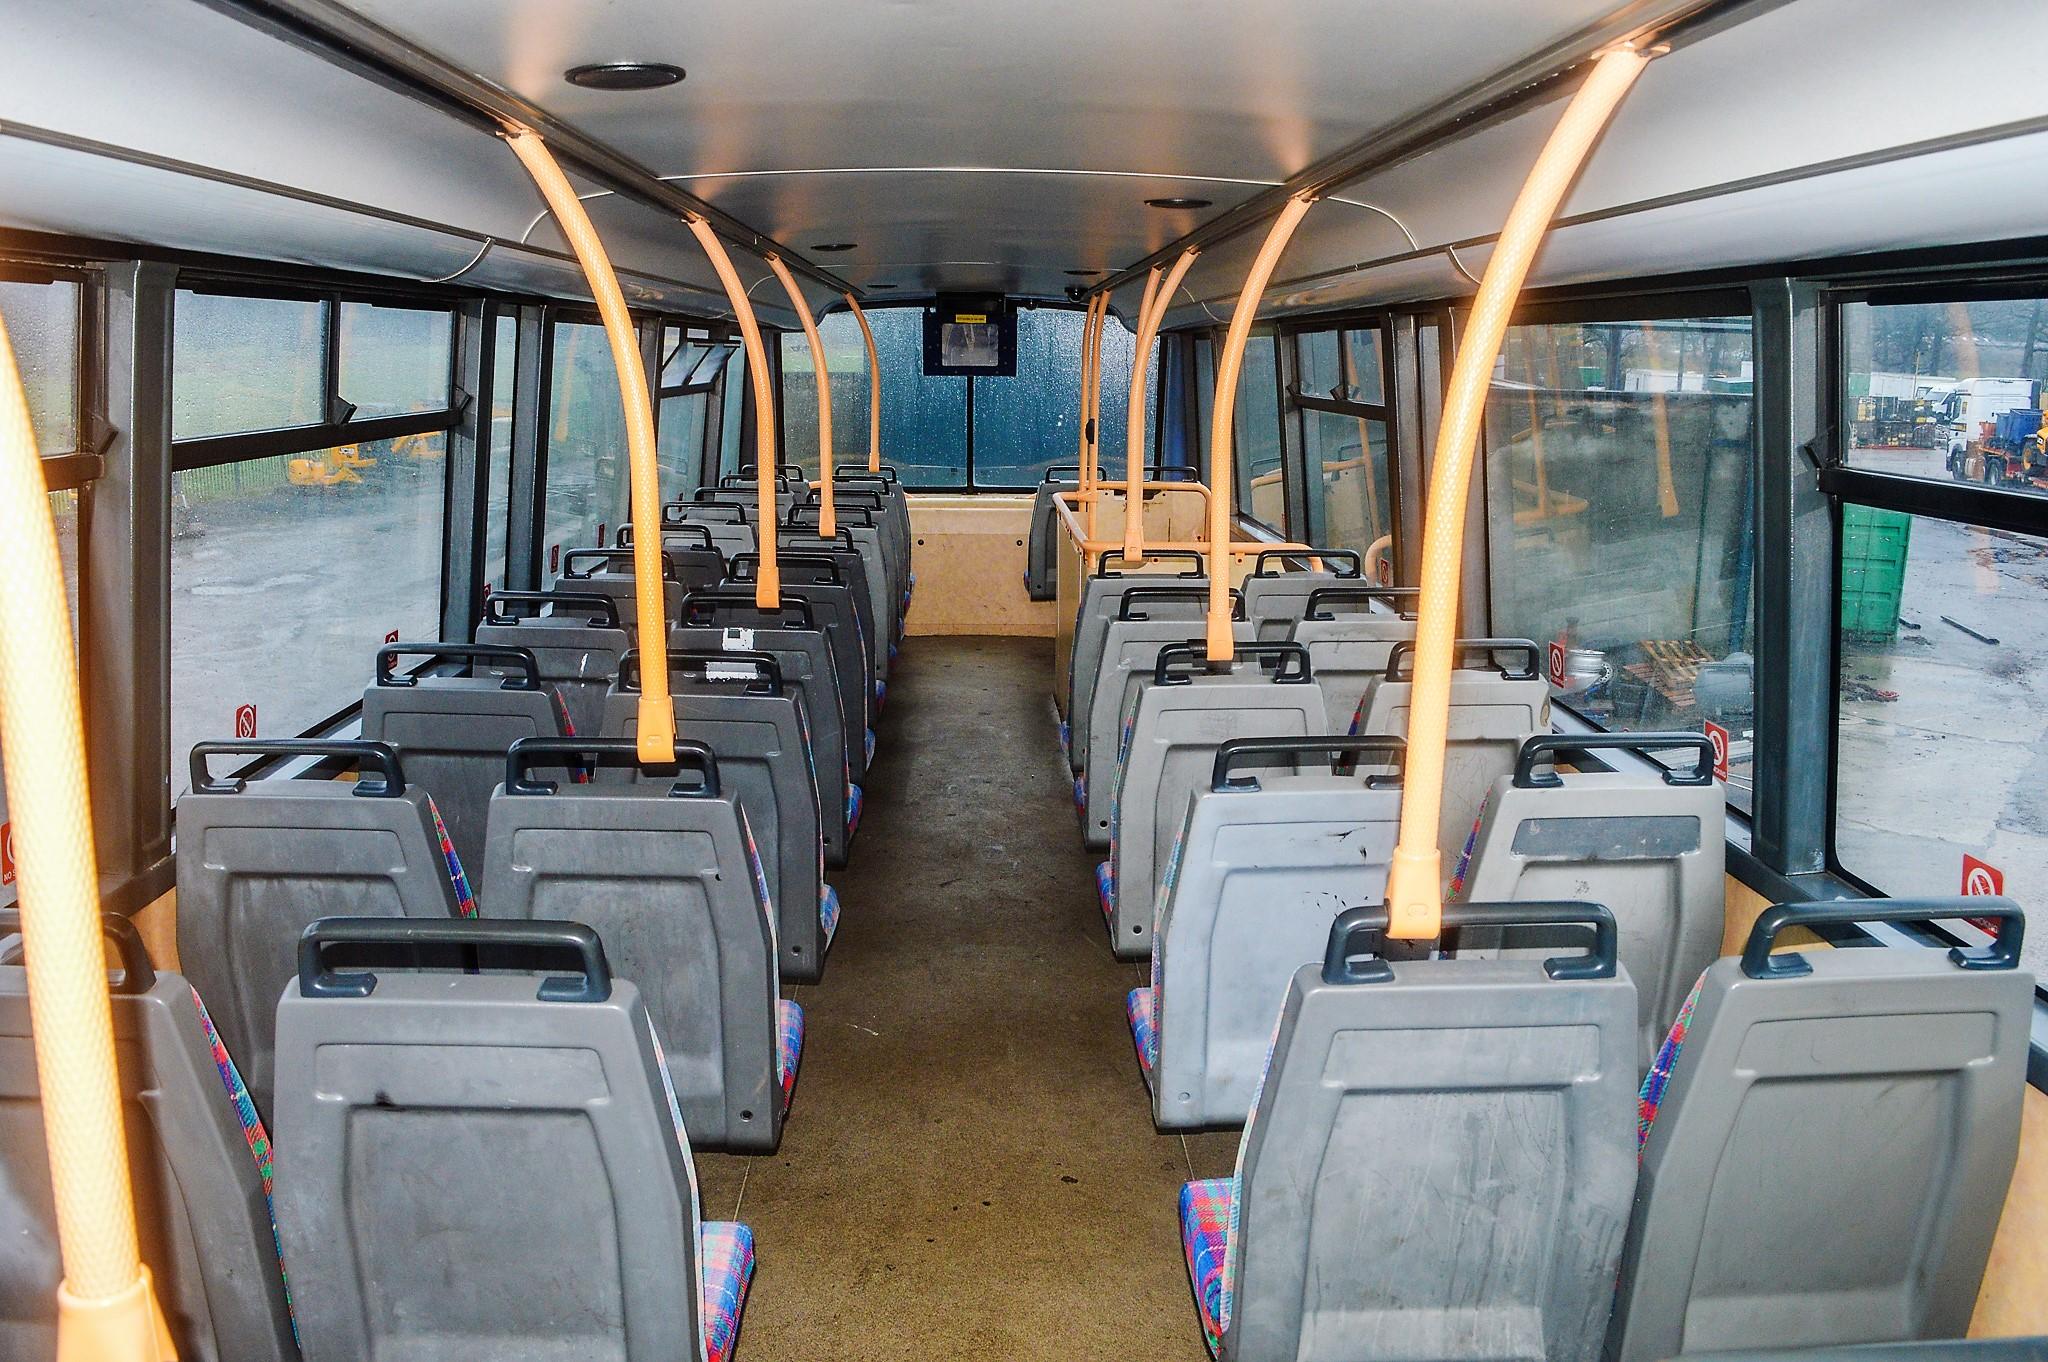 Lot 12 - Alexander Dennis Trident Plaxton President 75 seat double deck service bus Registration Number: V532